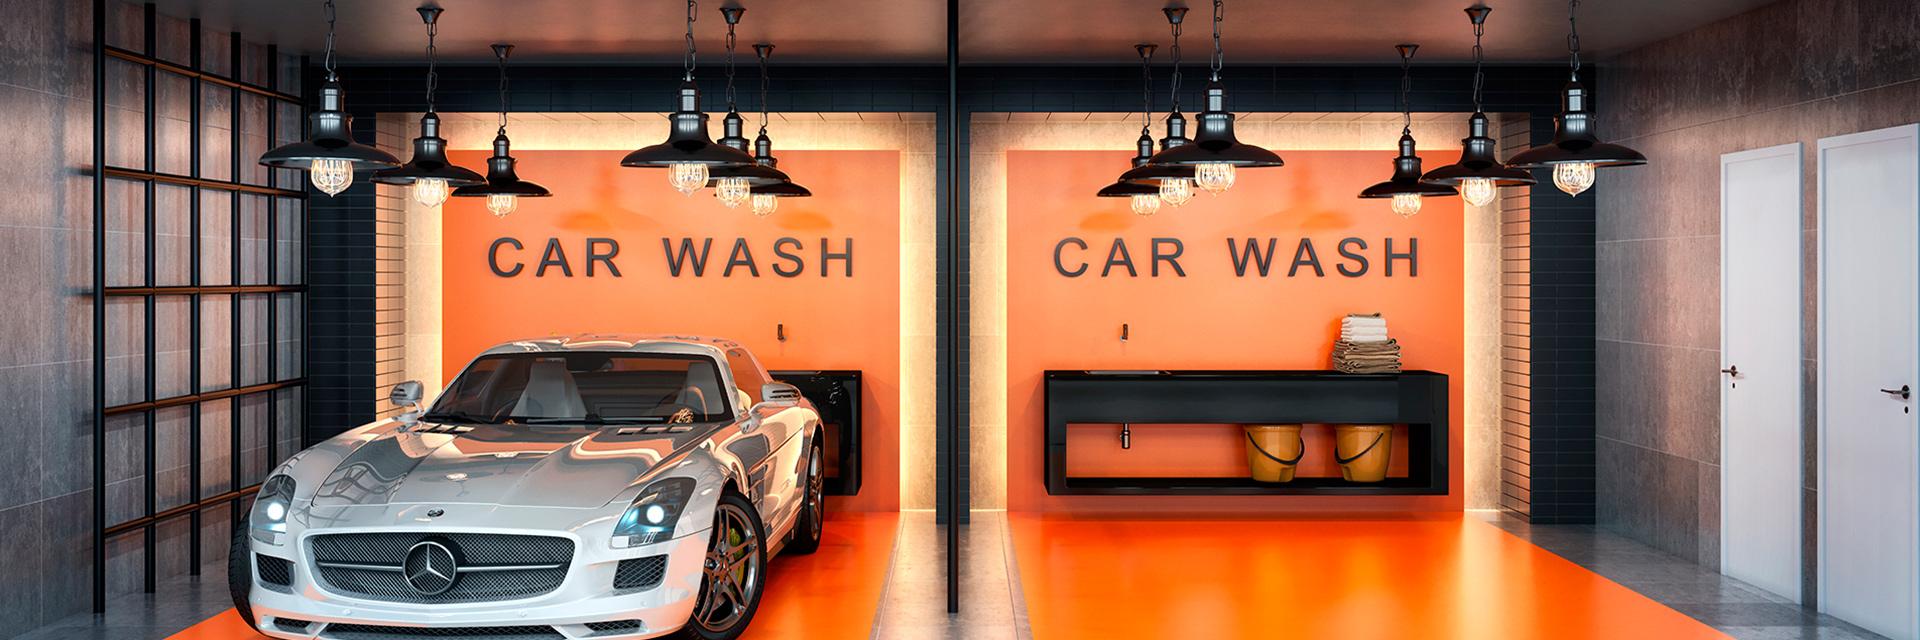 Perspectiva Ilustrada do Car Wash